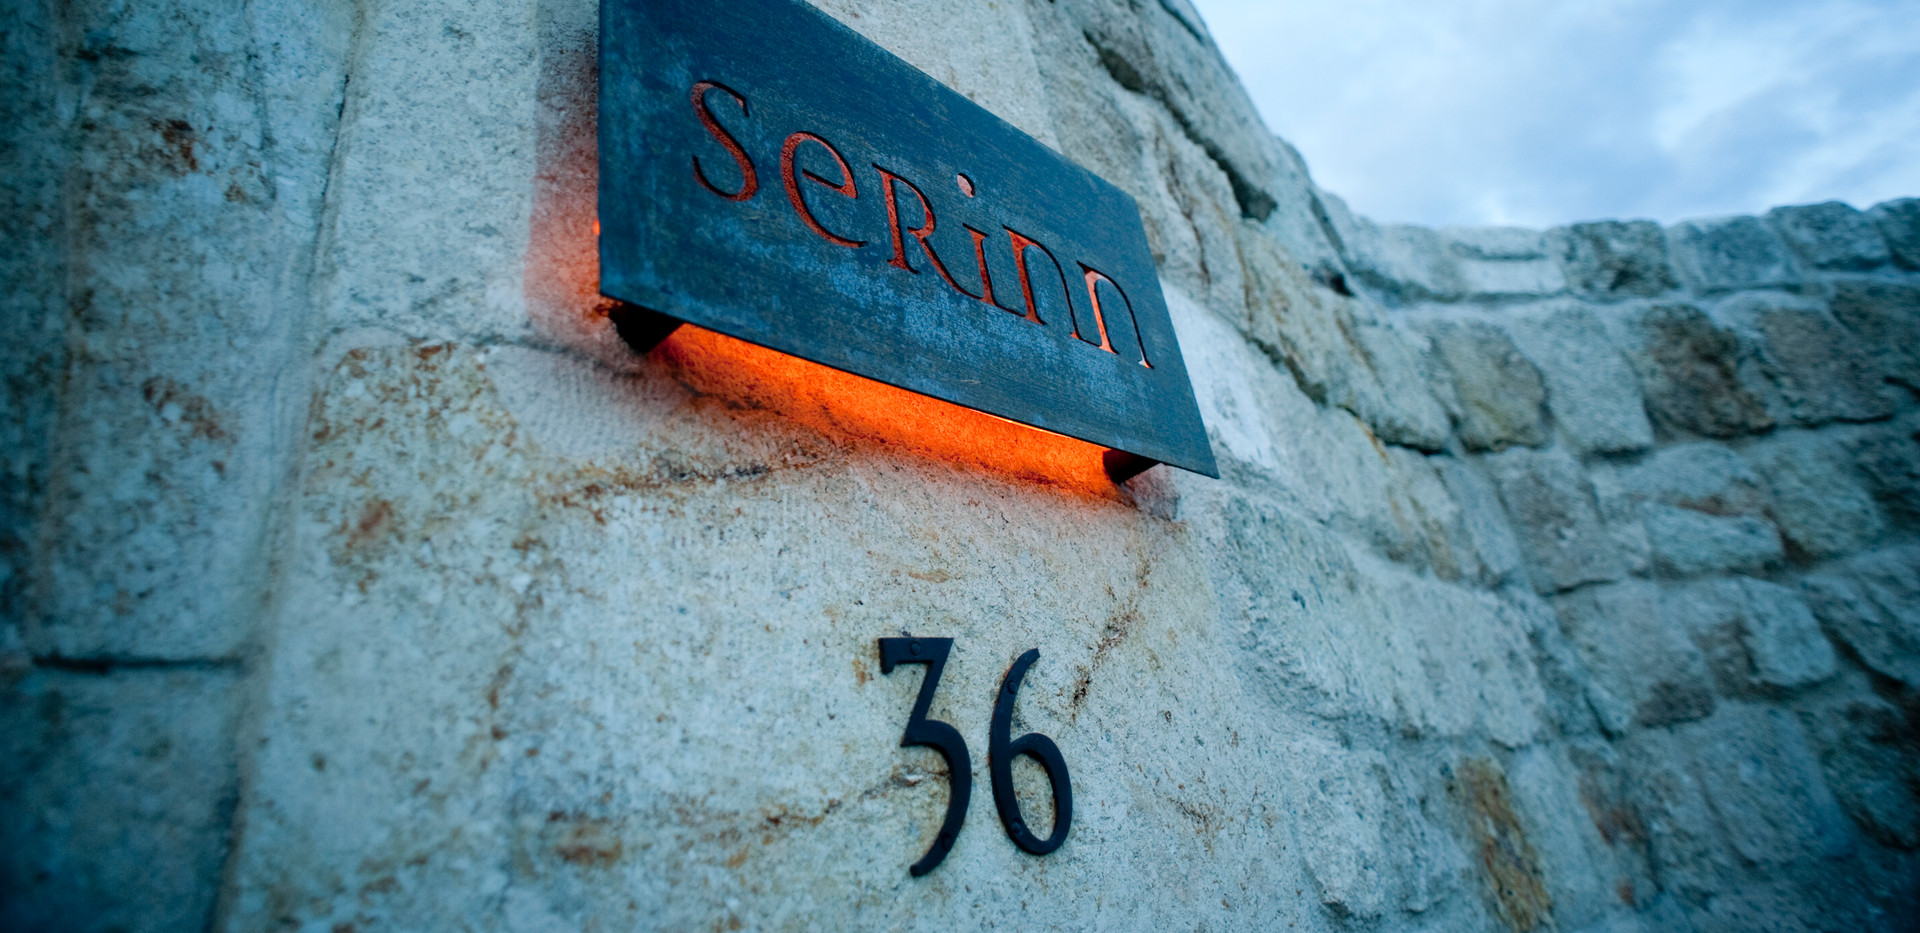 Serinn House, Cappadocia